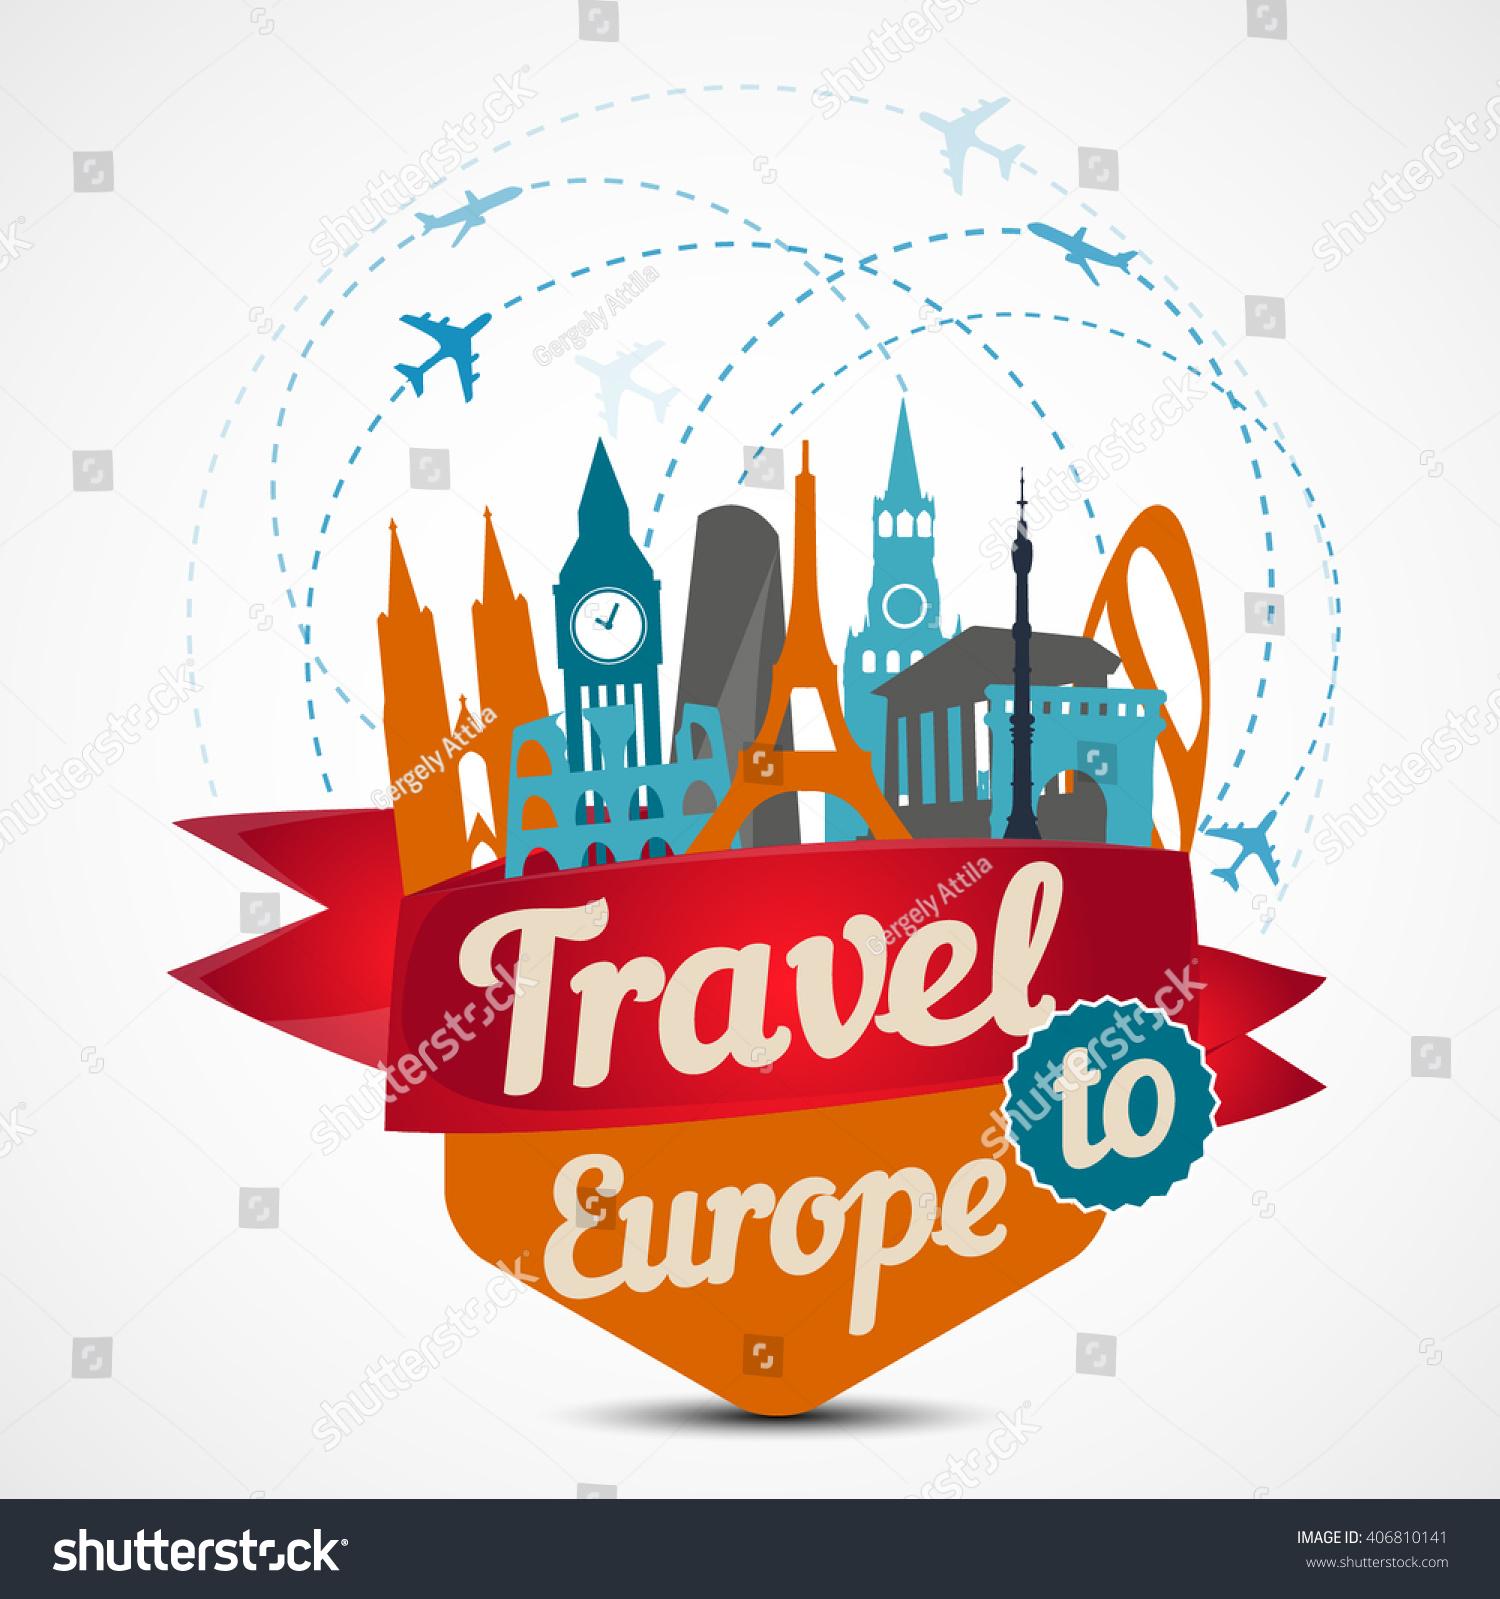 Europe Skyline Detailed Silhouette Vector Illustration Stock - Travel to europe